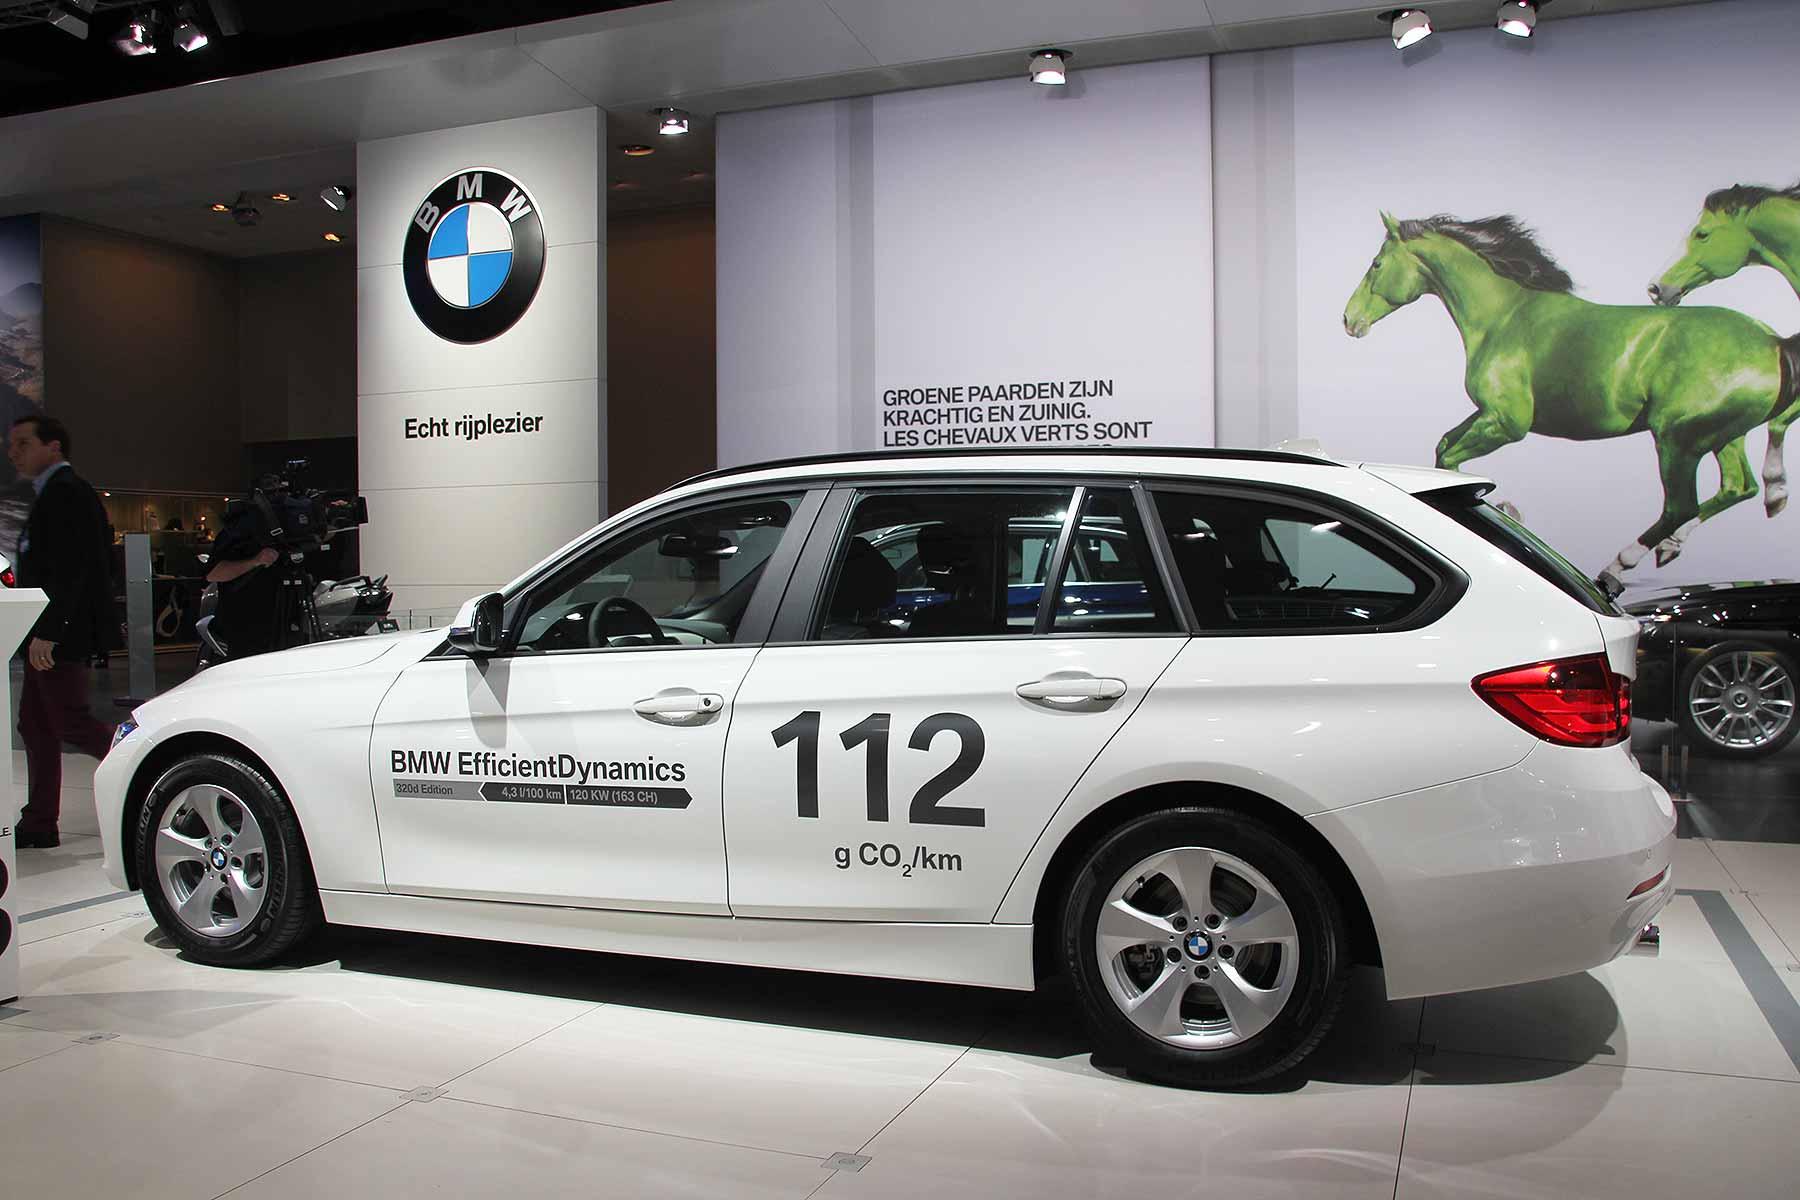 BMW 320d company car